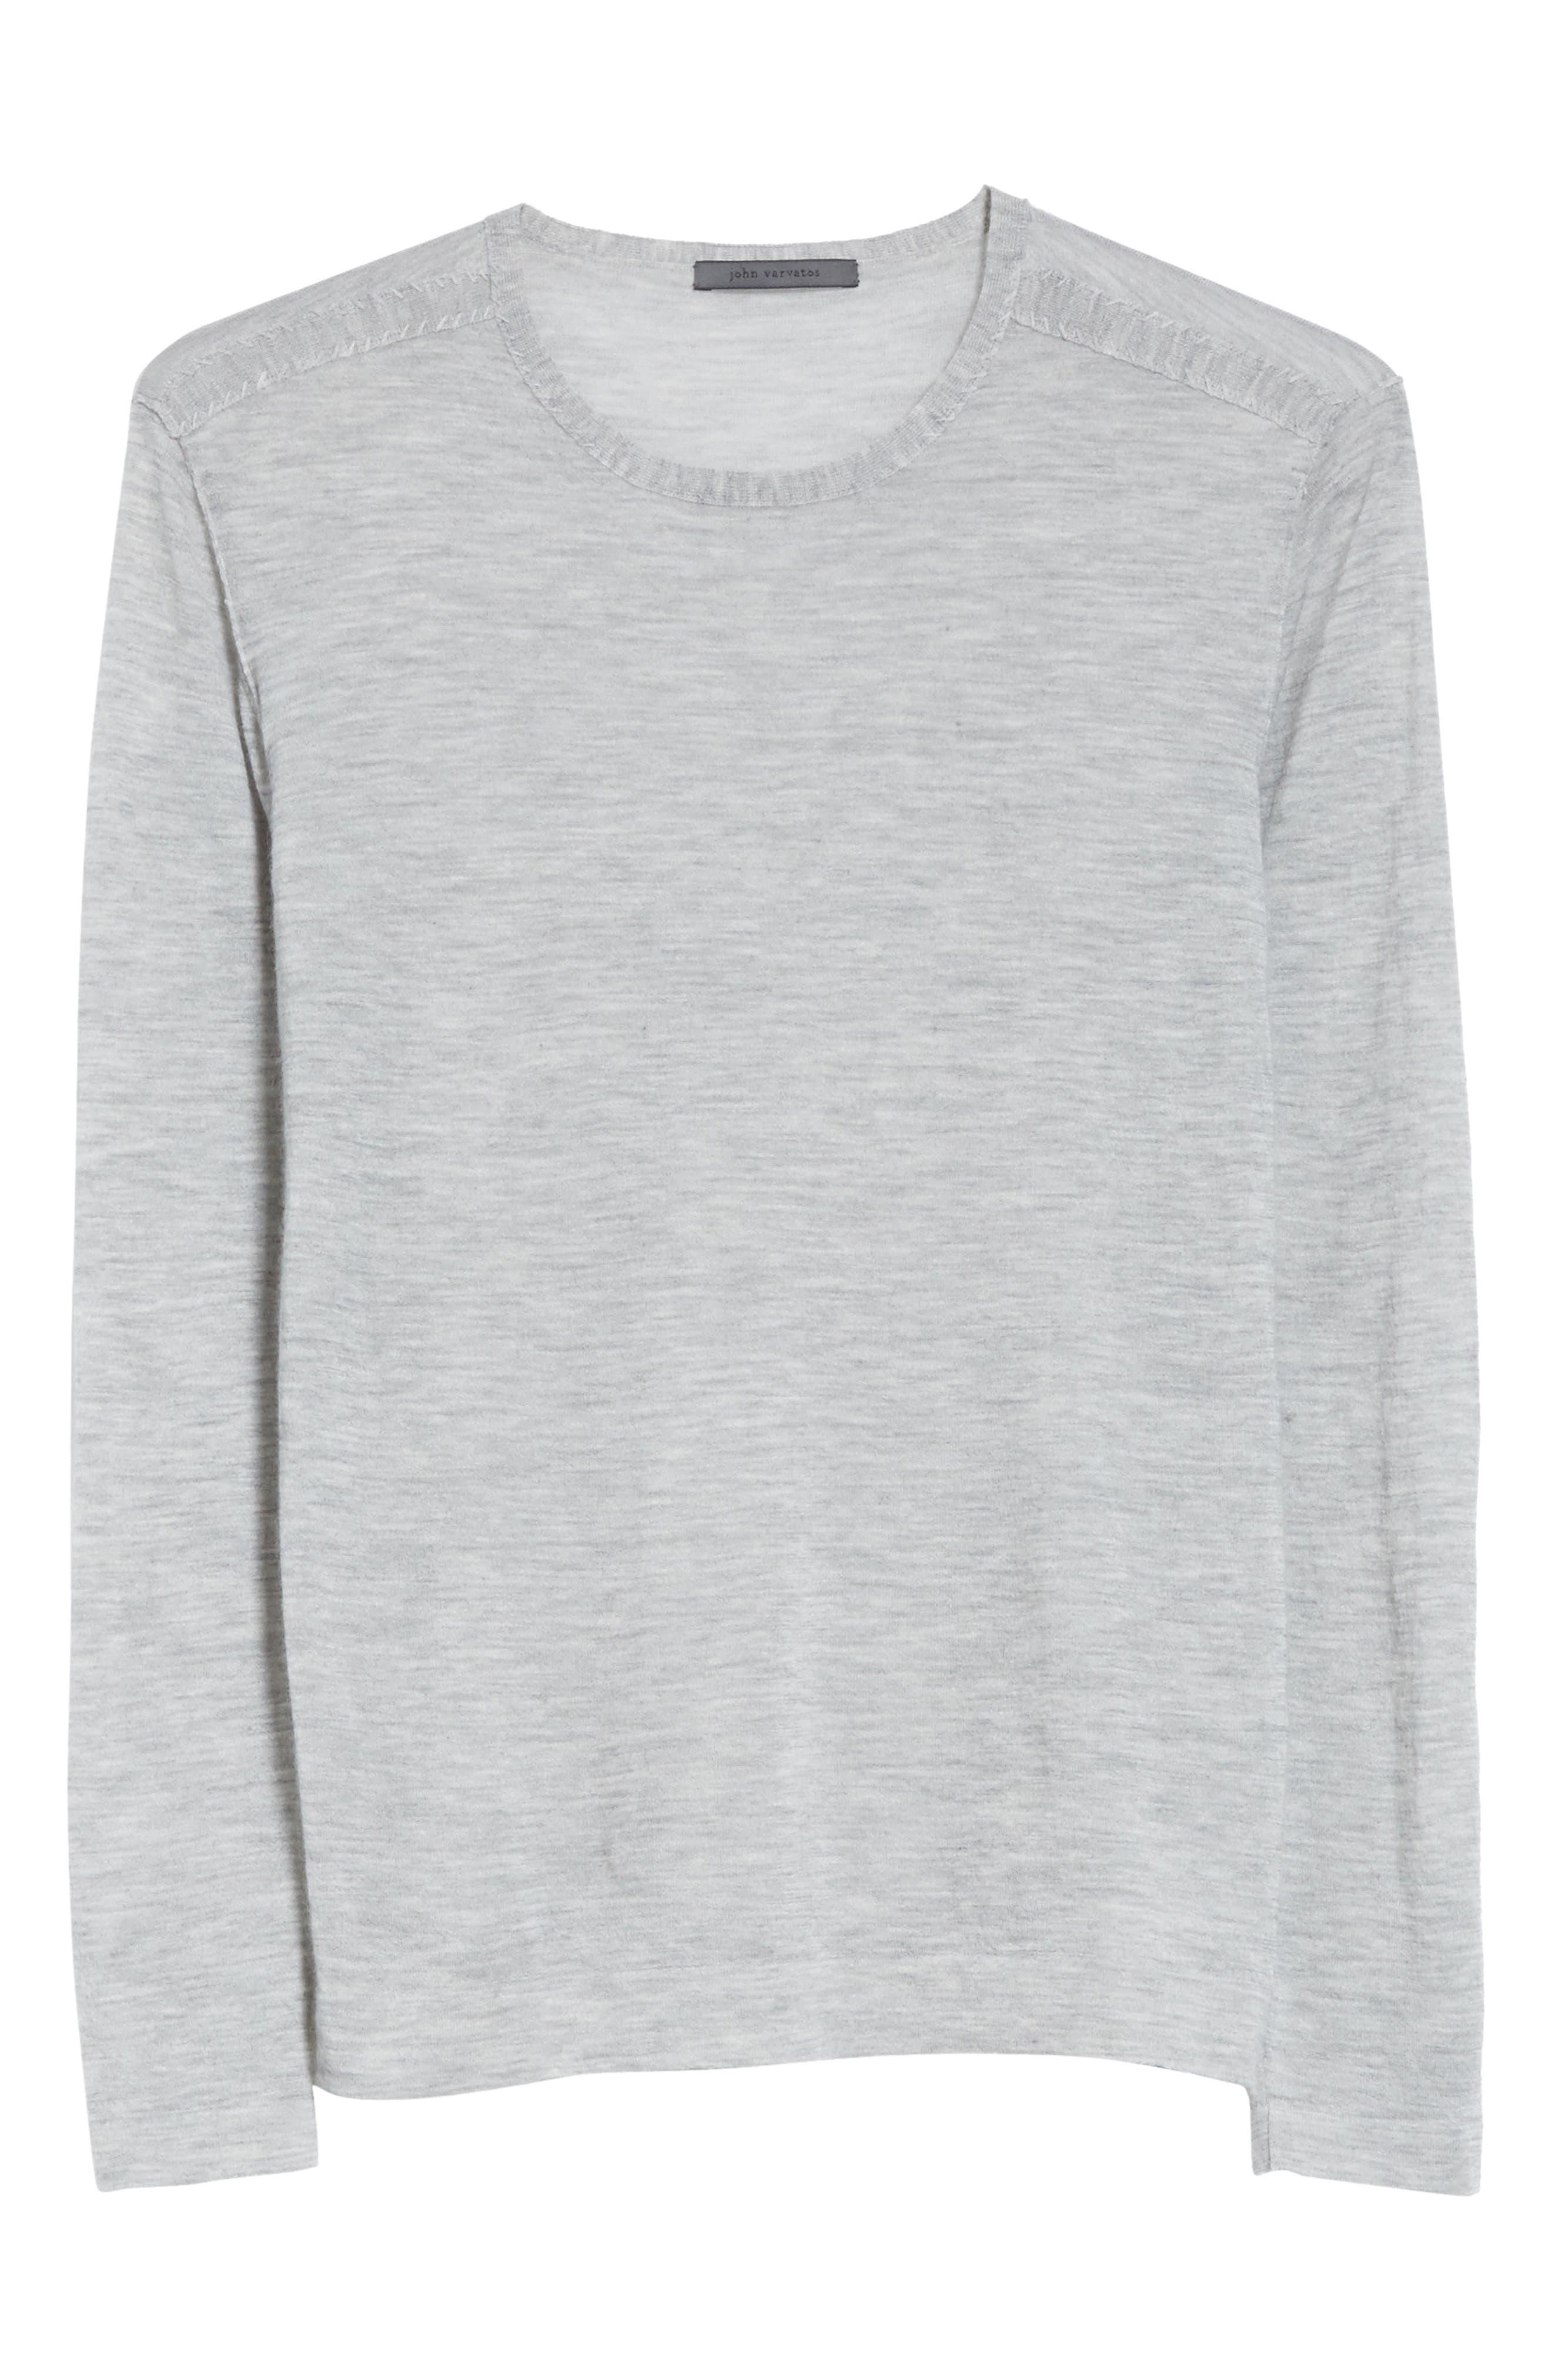 Cashmere Crewneck Sweater,                             Alternate thumbnail 6, color,                             055